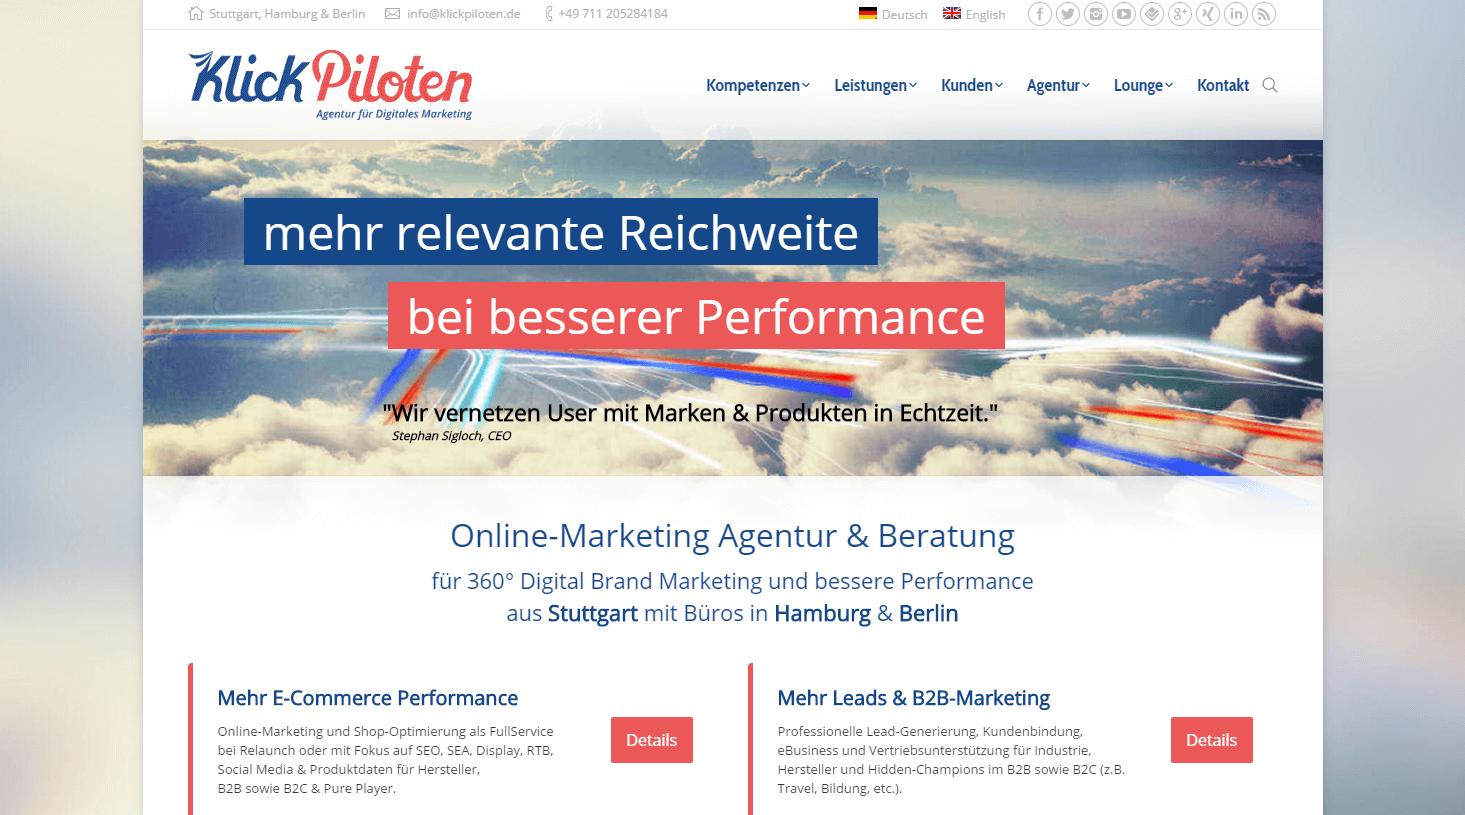 klickpiloten web site